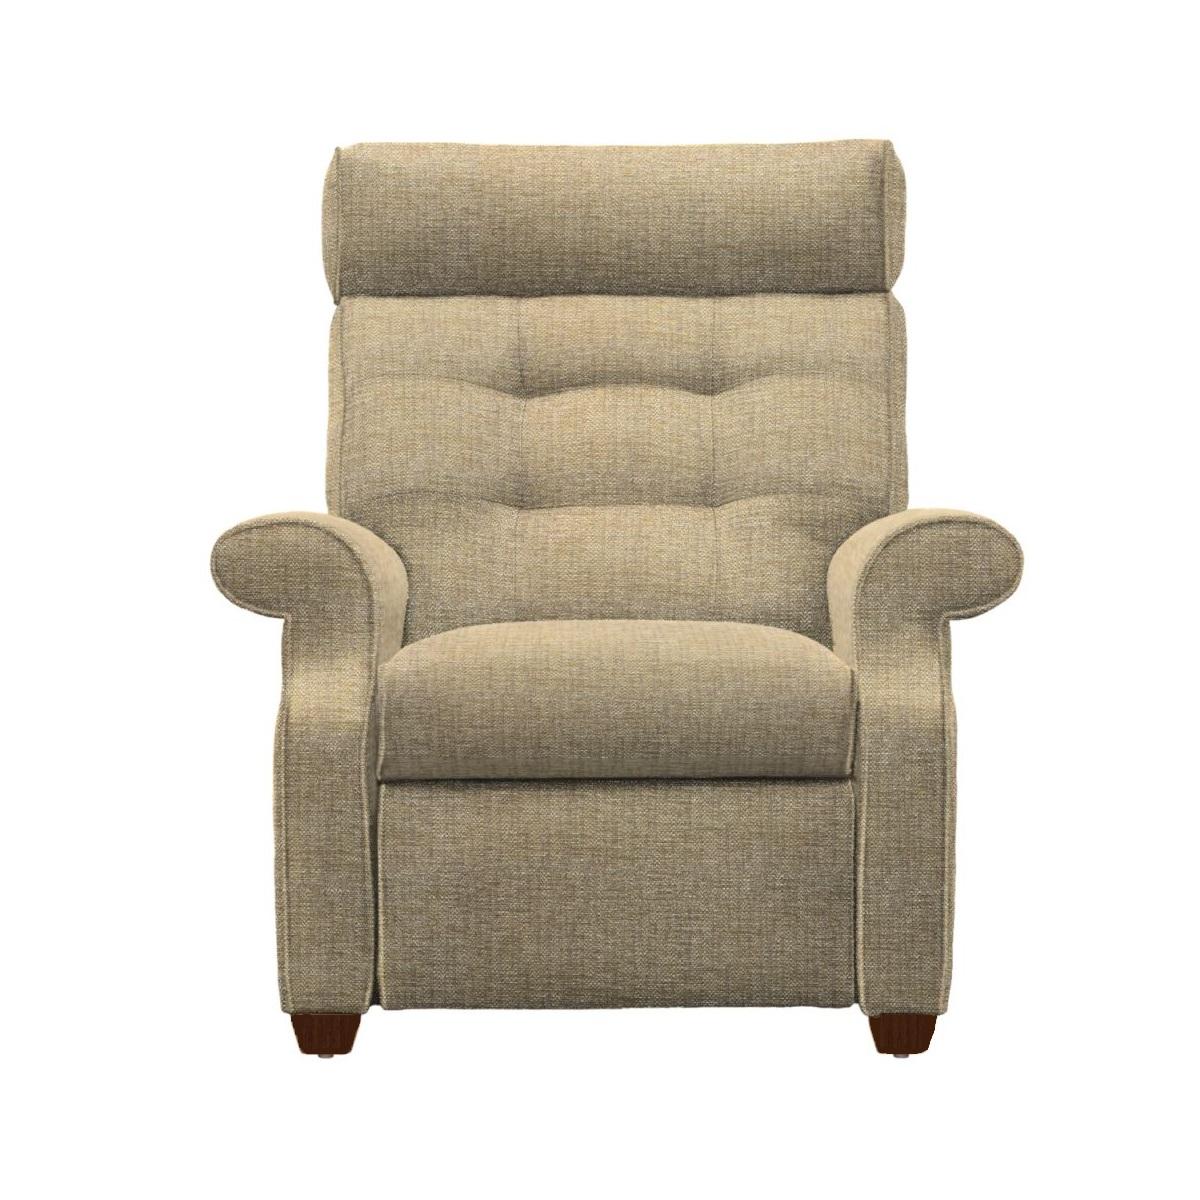 Parker Knoll Norton 150 Rise & Recline Power Chair